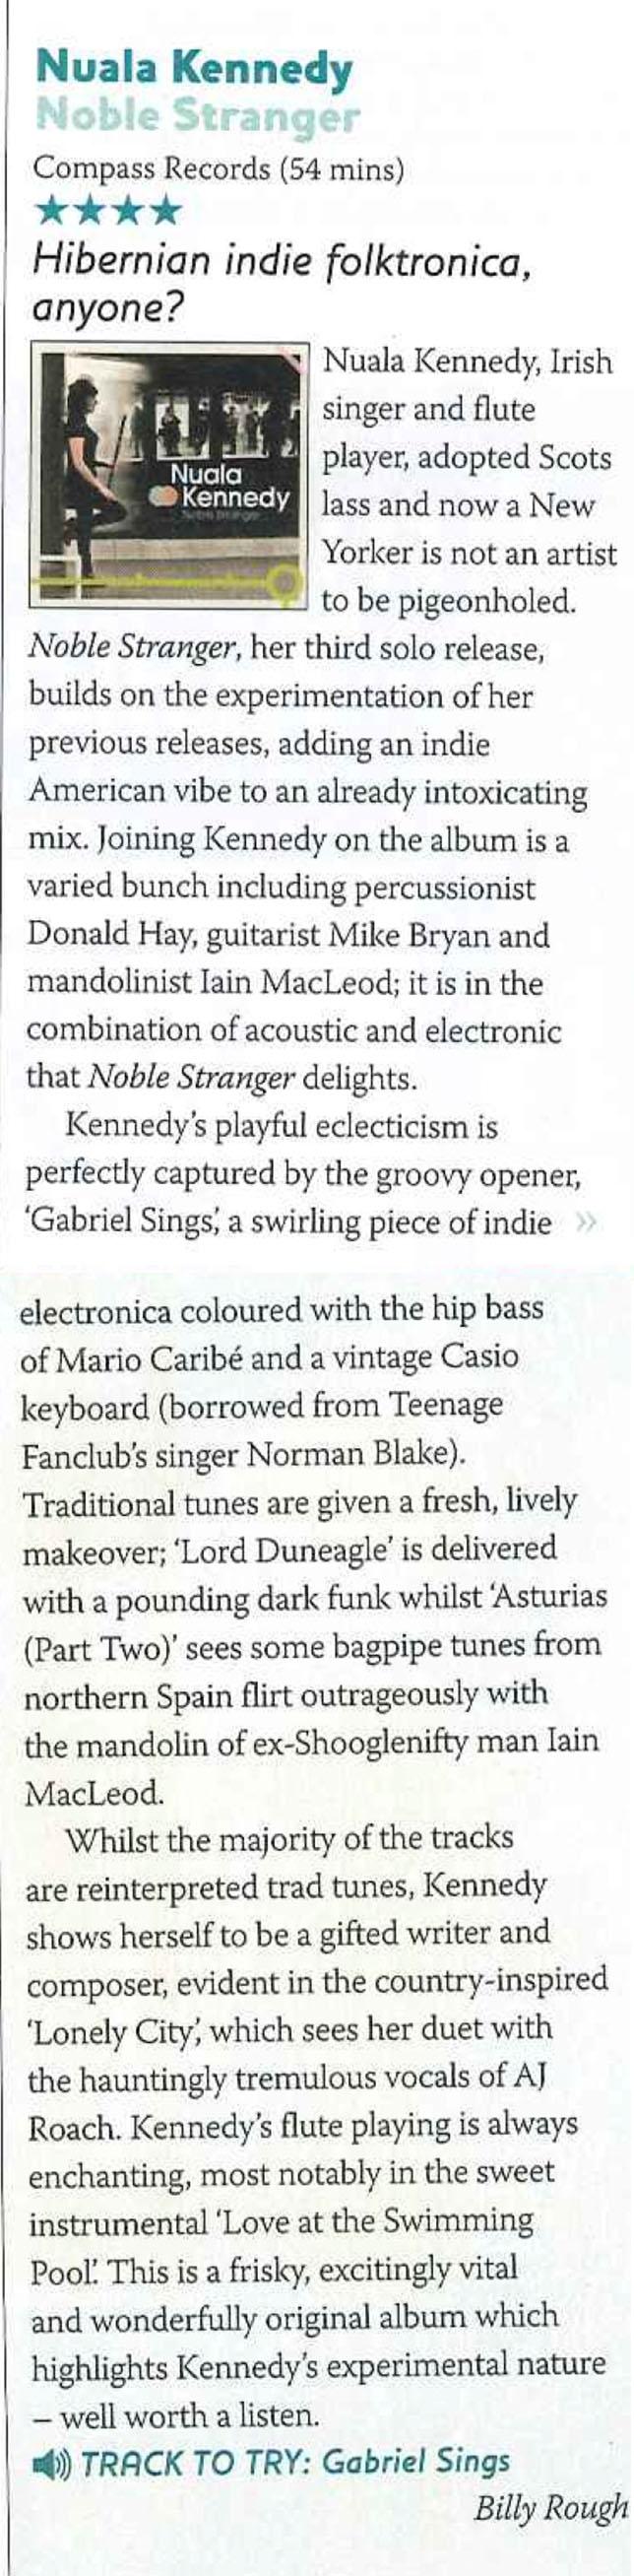 Nuala Kennedy Noble Stranger review Songlines.jpg